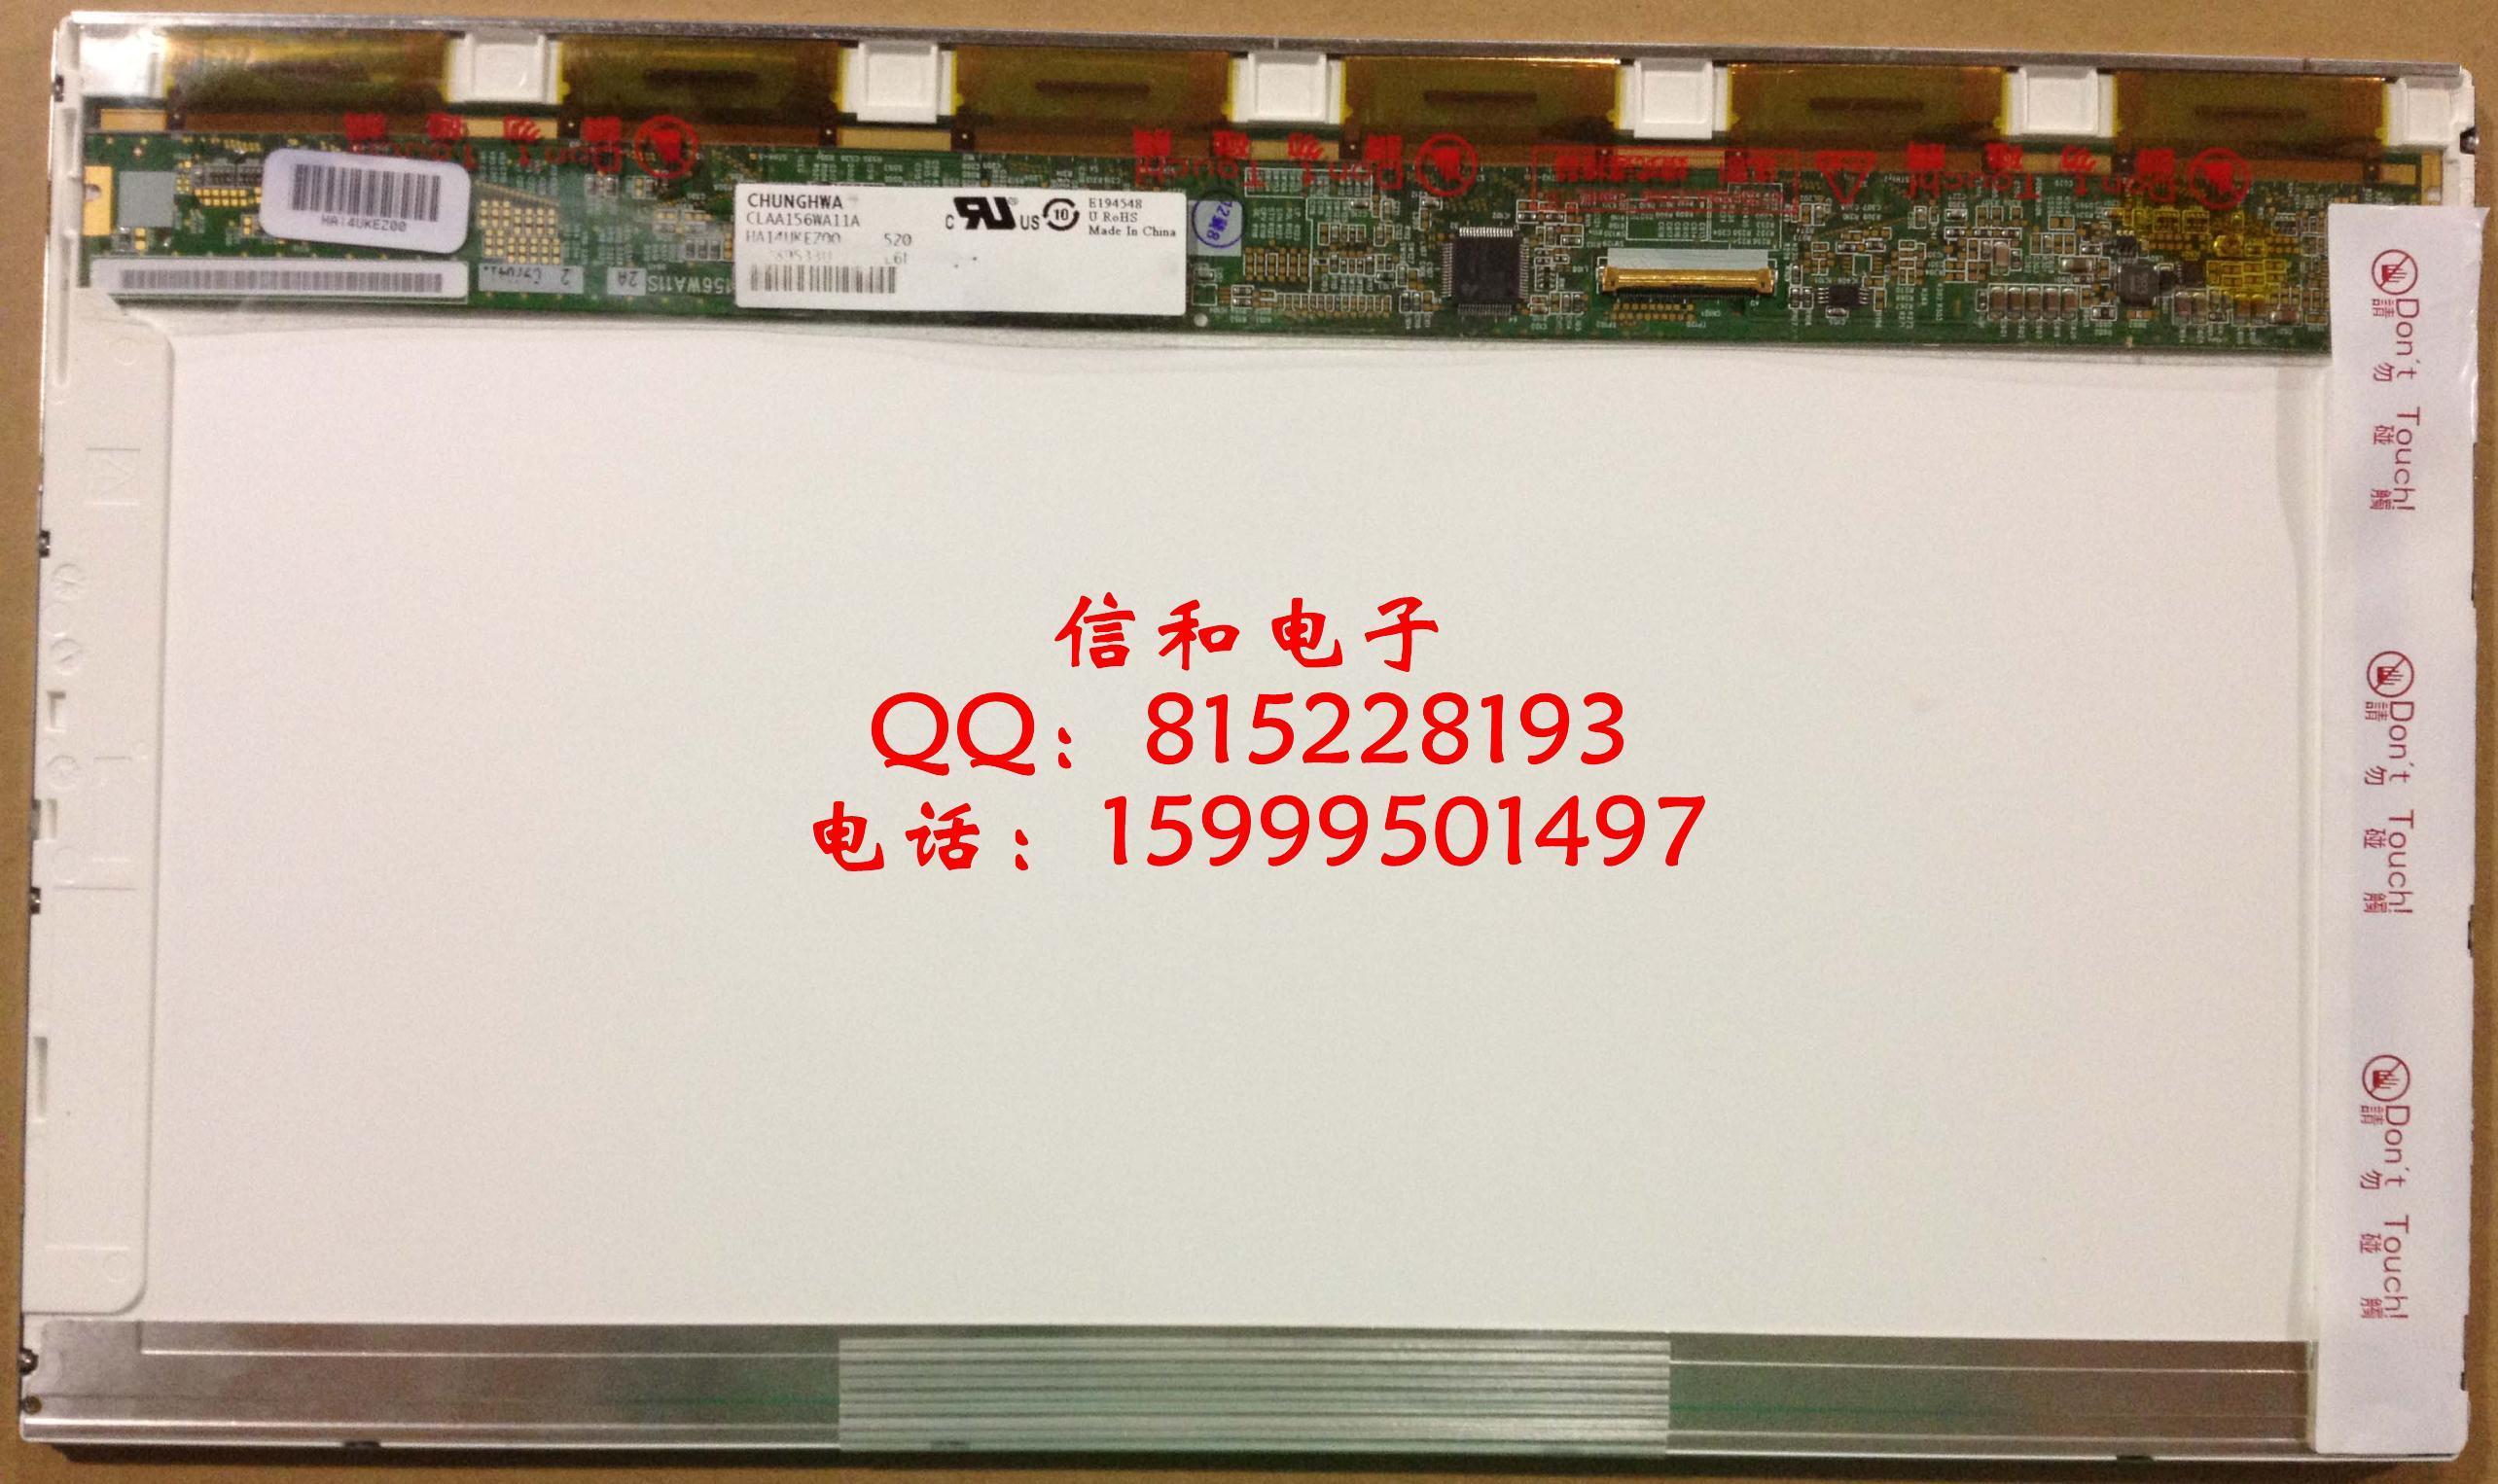 Комплектующие и запчасти для ноутбуков CLAA156WA11A CLAA156WB11A LTN156AT15 156LED запчасти для мотоциклов yamaha 100 100 5wb5wy100